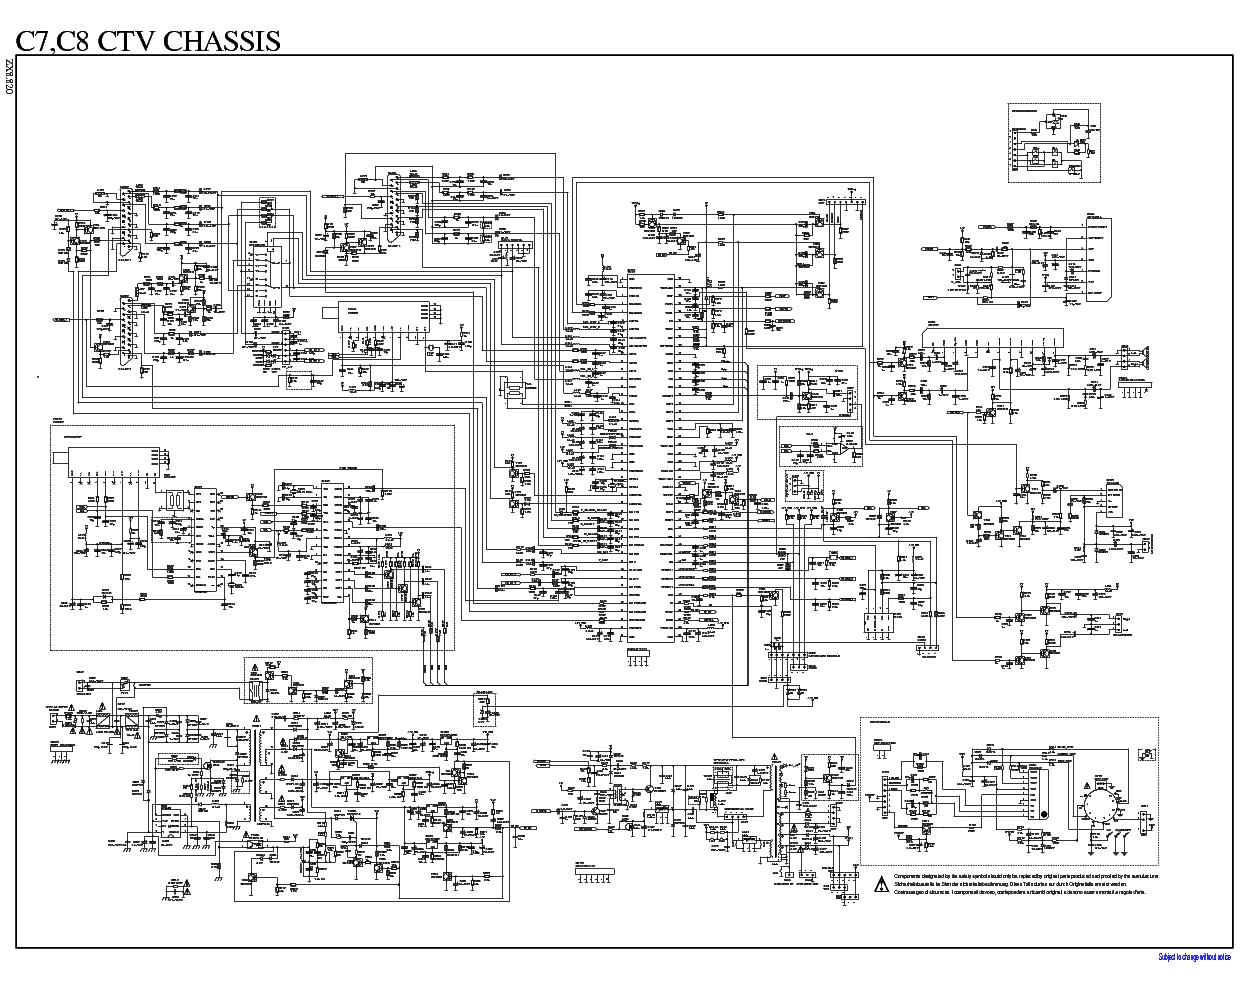 BEKO C7,C8 ZX8.820,293 Service Manual download, schematics